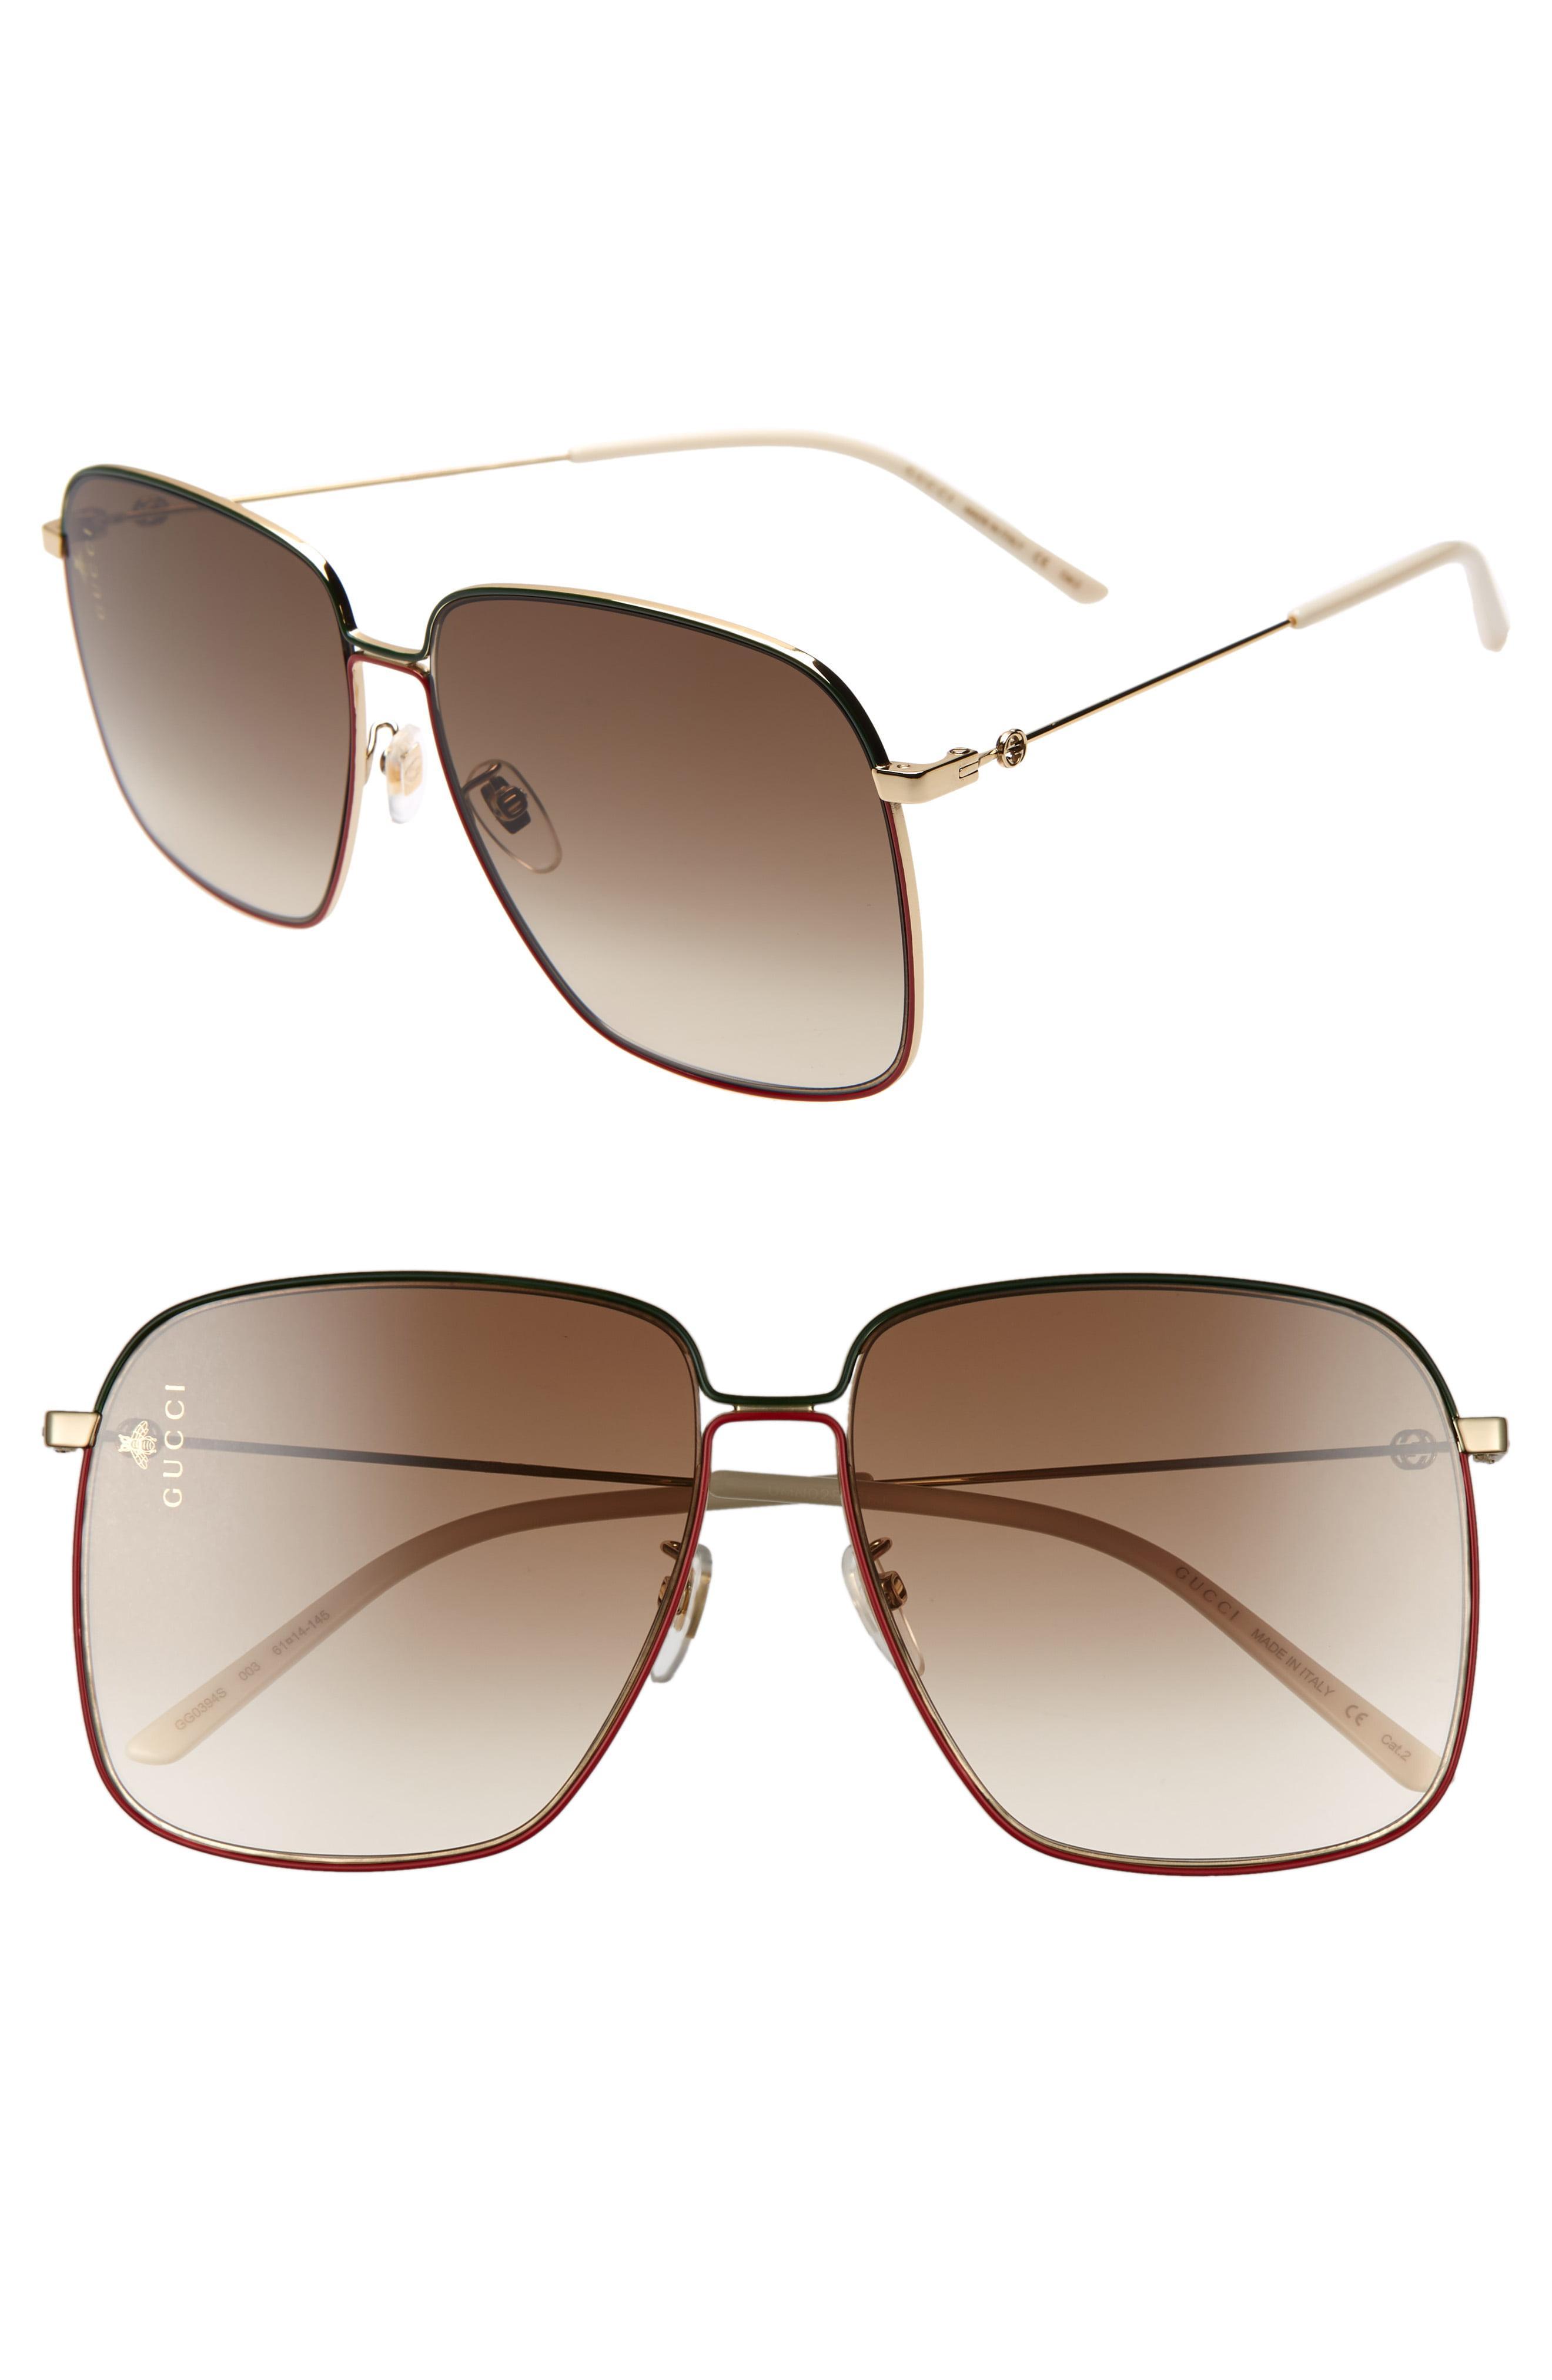 a485fb2b9ef Gucci - Brown 61mm Square Sunglasses - Lyst. View fullscreen